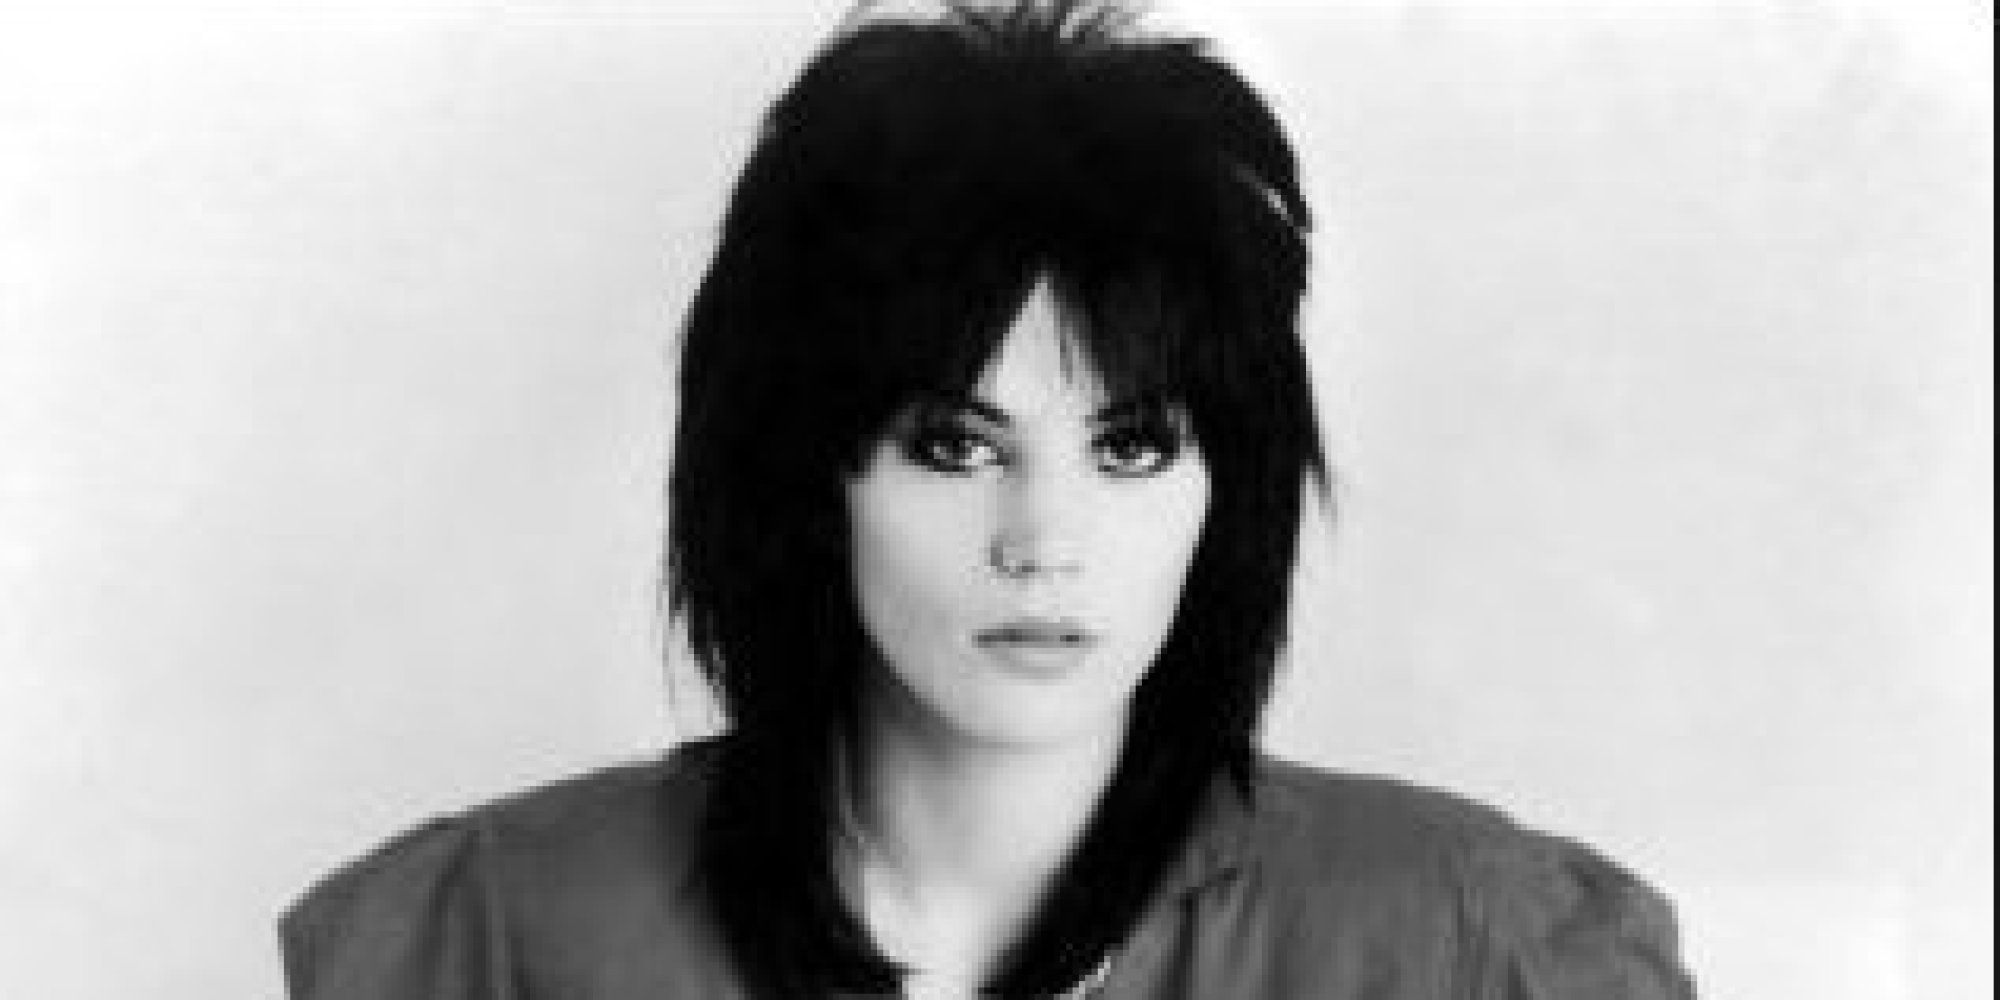 Joan Jett Here39s Hoping Joan Jett39s Hair Never Goes Out Of Style. Joan Jett   Alchetron  The Free Social Encyclopedia